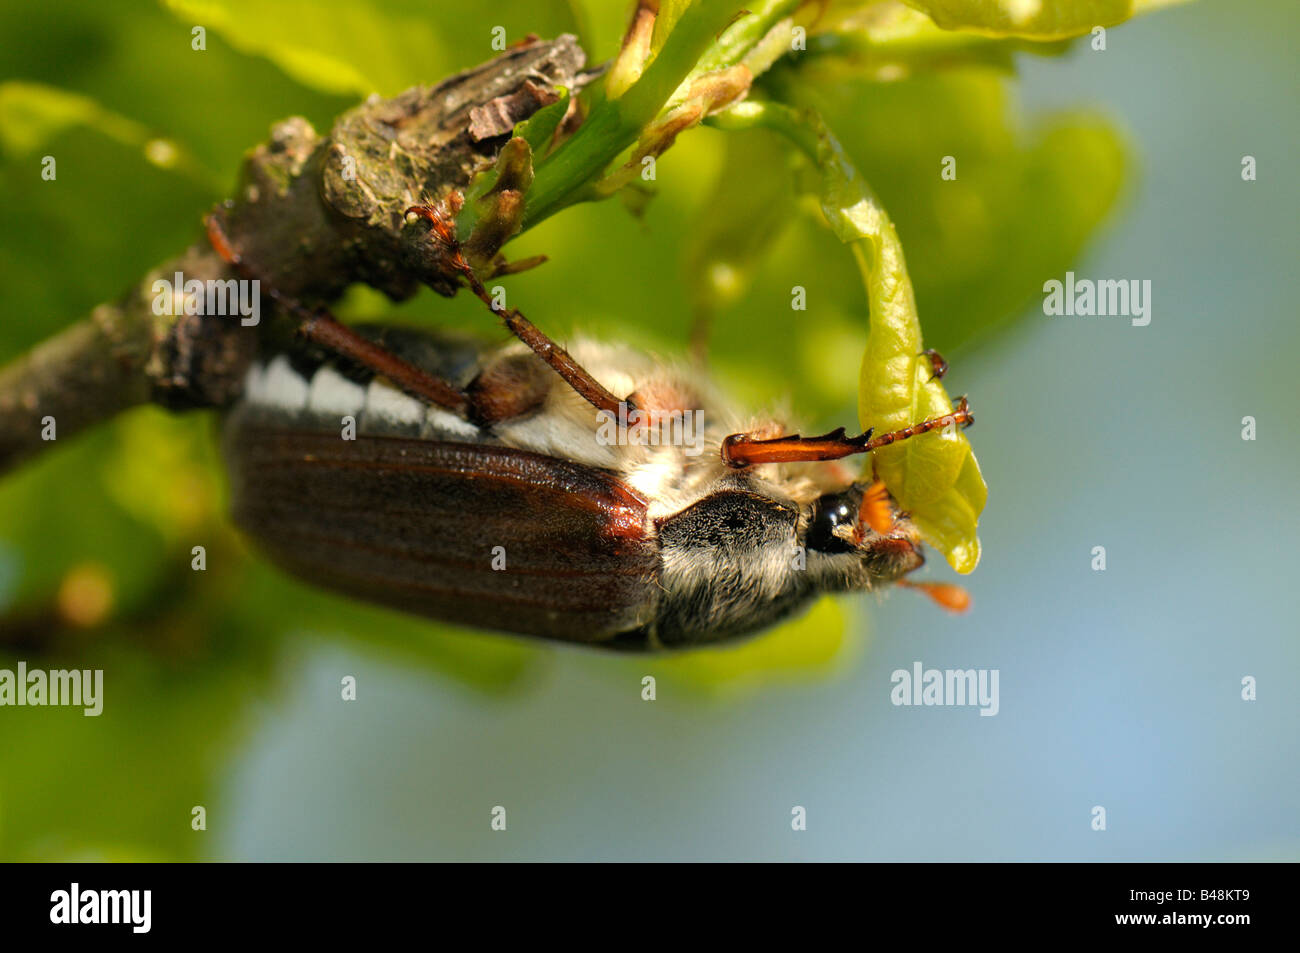 Common Cockchafer, Maybug (Melolontha melolontha) eating a fresh Oak leaf Stock Photo